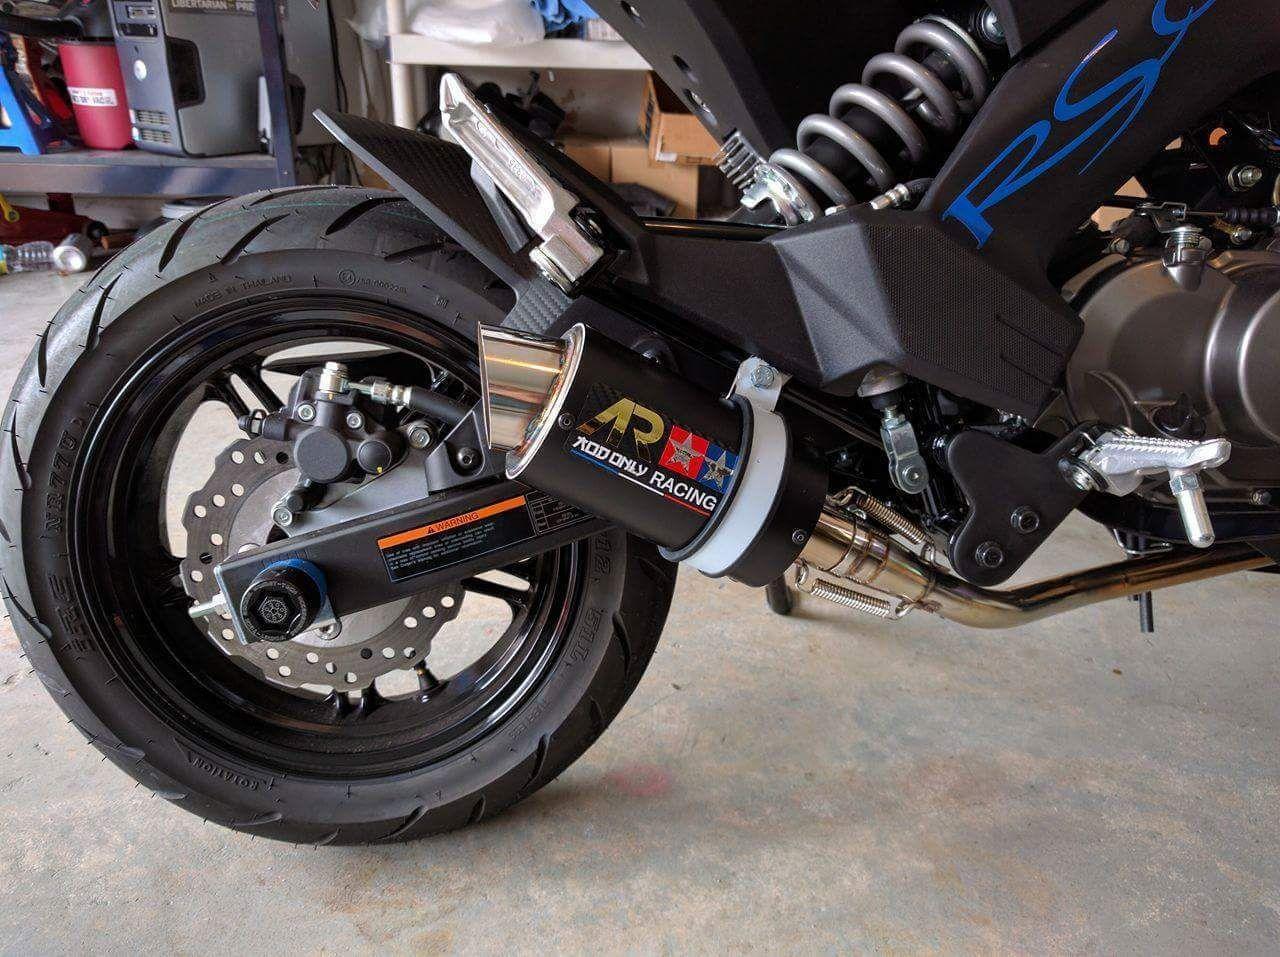 Kawasaki Z125 Pro z125 pro 2017 AR Low Mount Exhaust Full